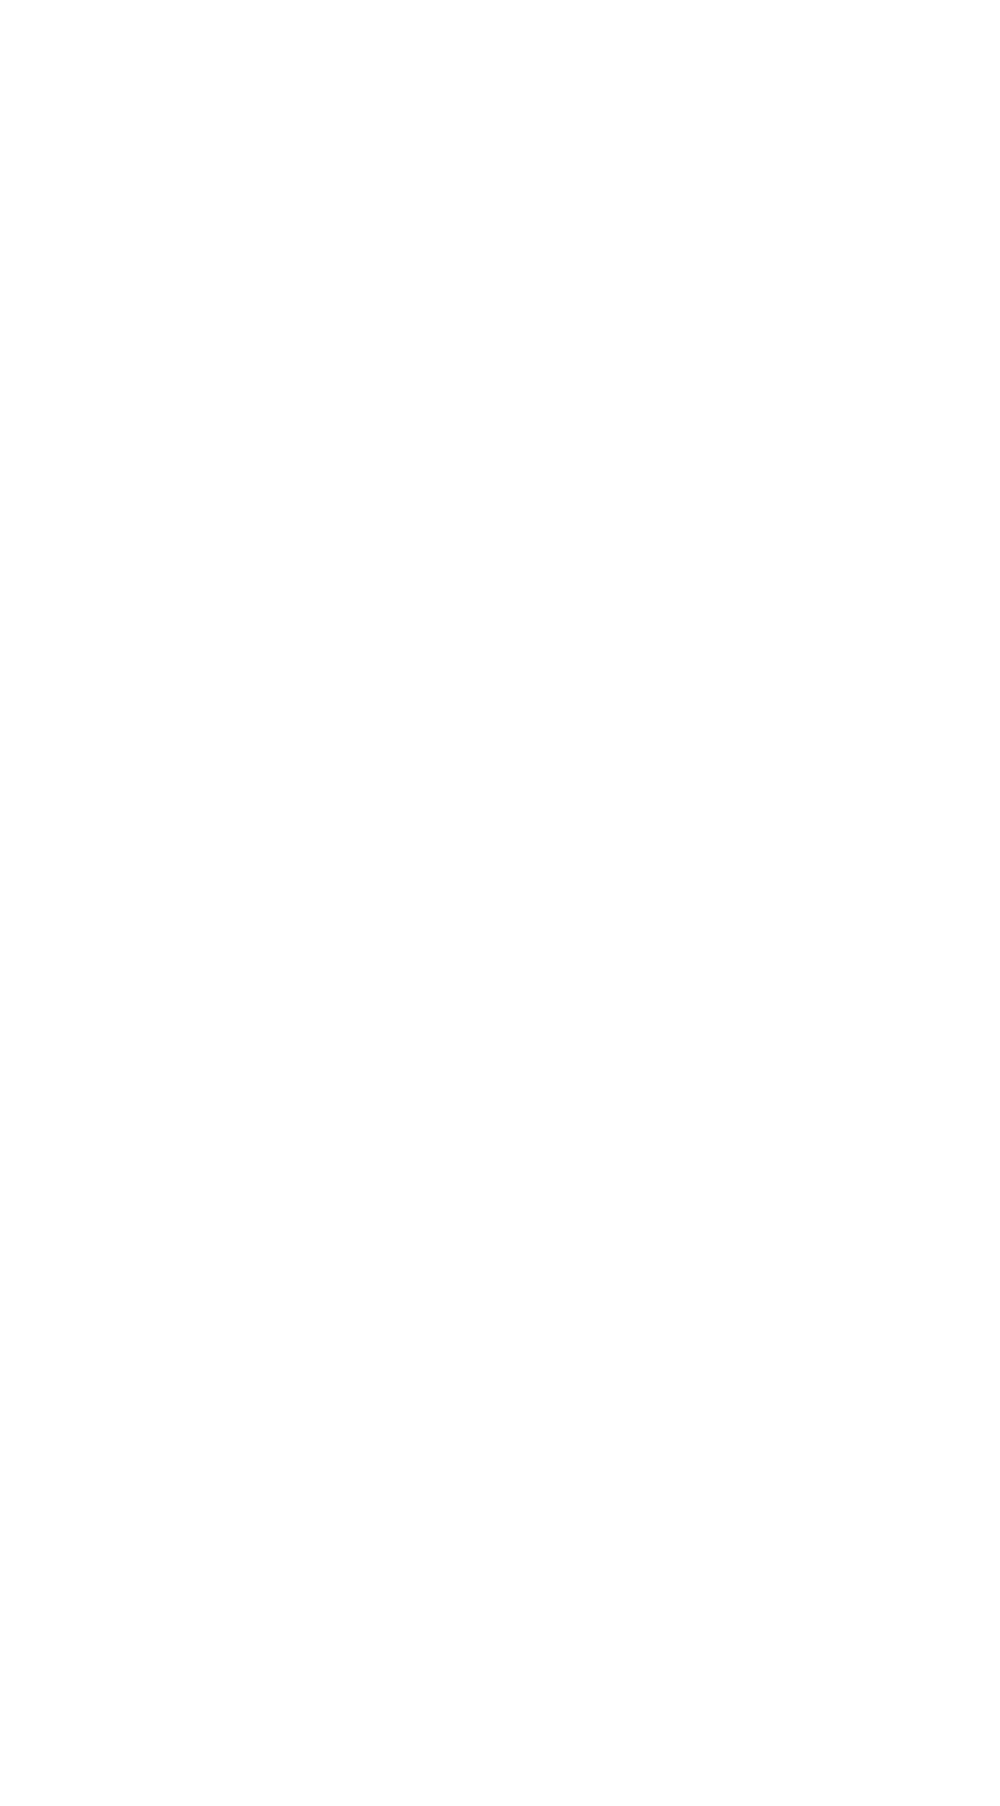 whitepadding.jpg